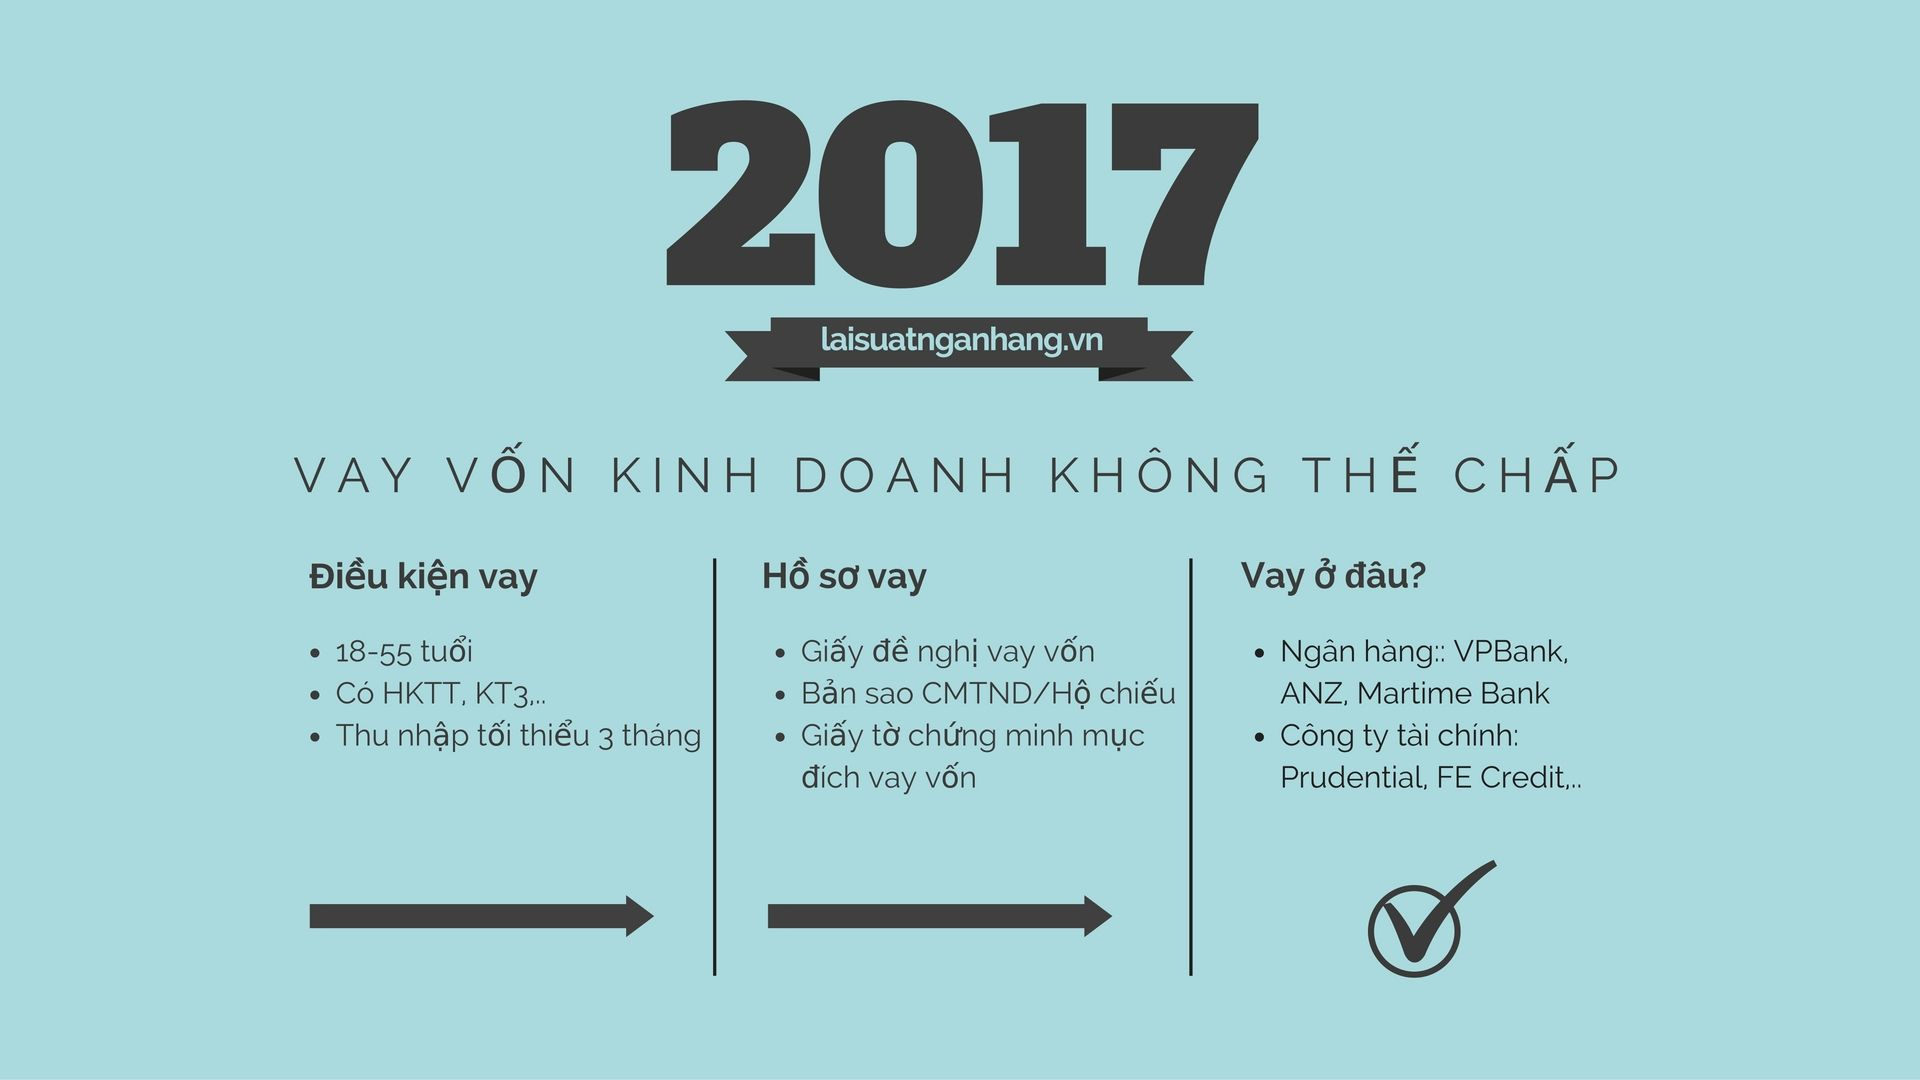 loi-tat-giup-ban-vay-von-kinh-doanh-khong-can-the-chap-trong-mot-not-nhac